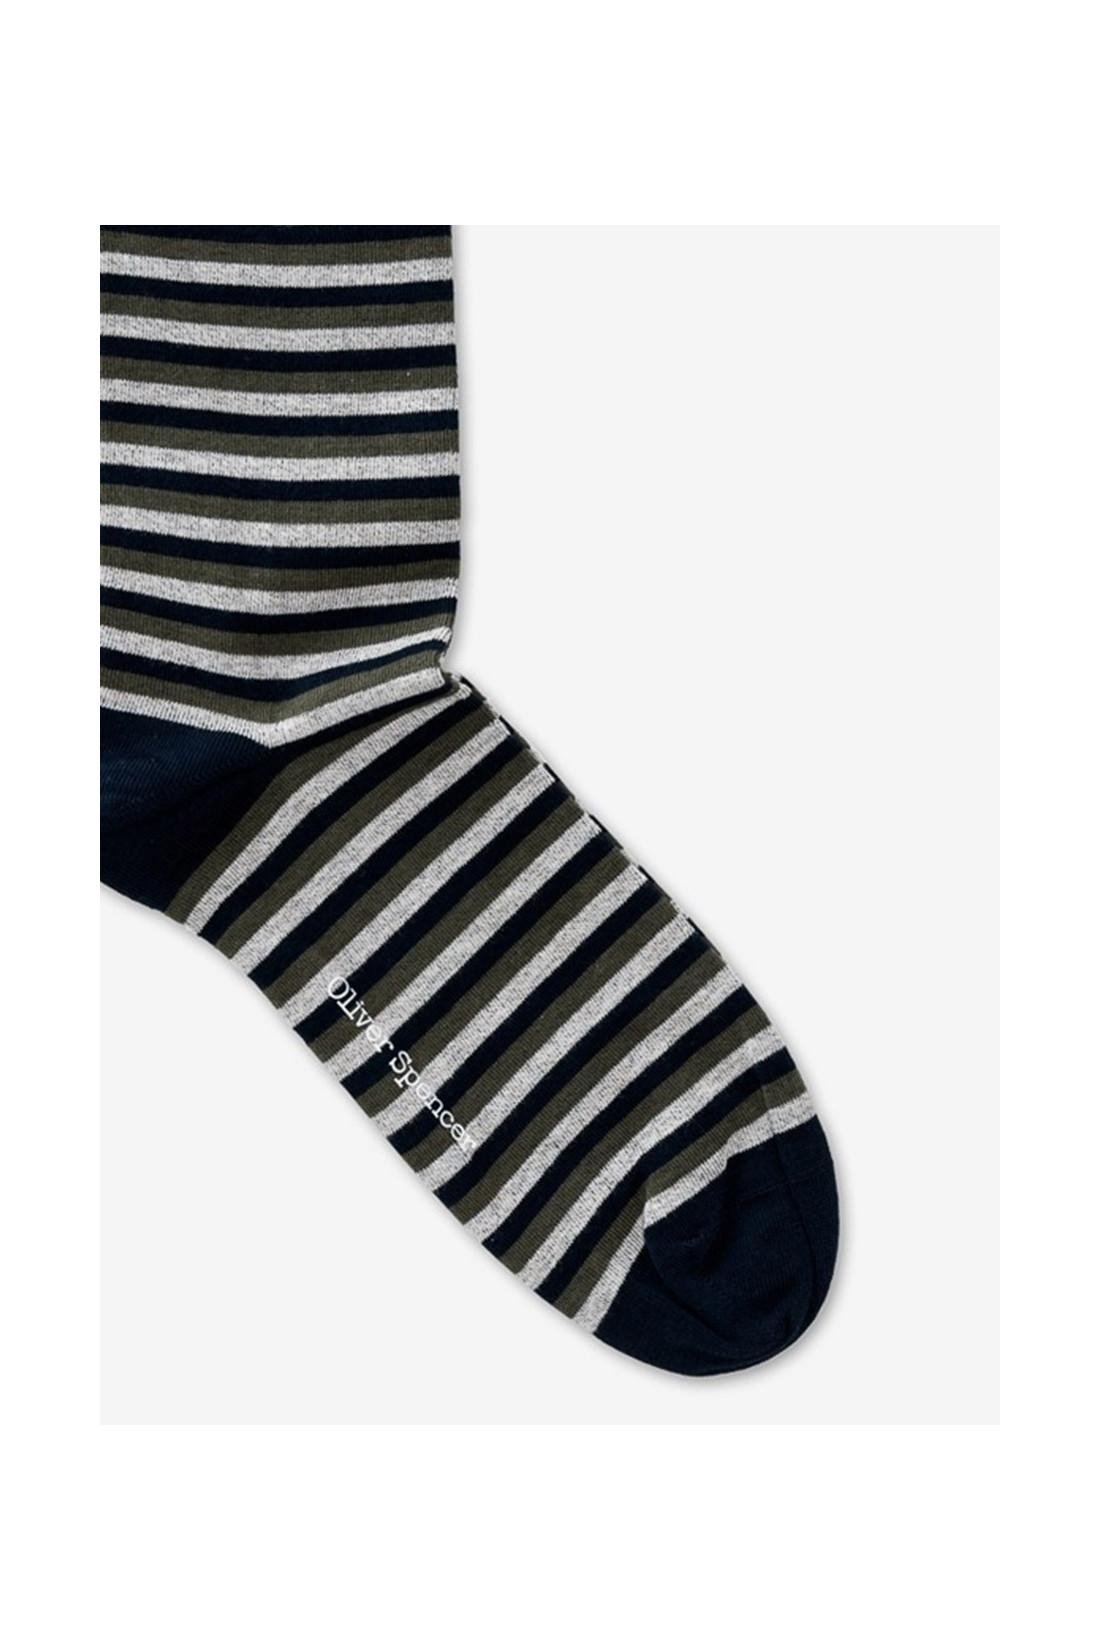 OLIVER SPENCER / Miller sock briggs Green multi